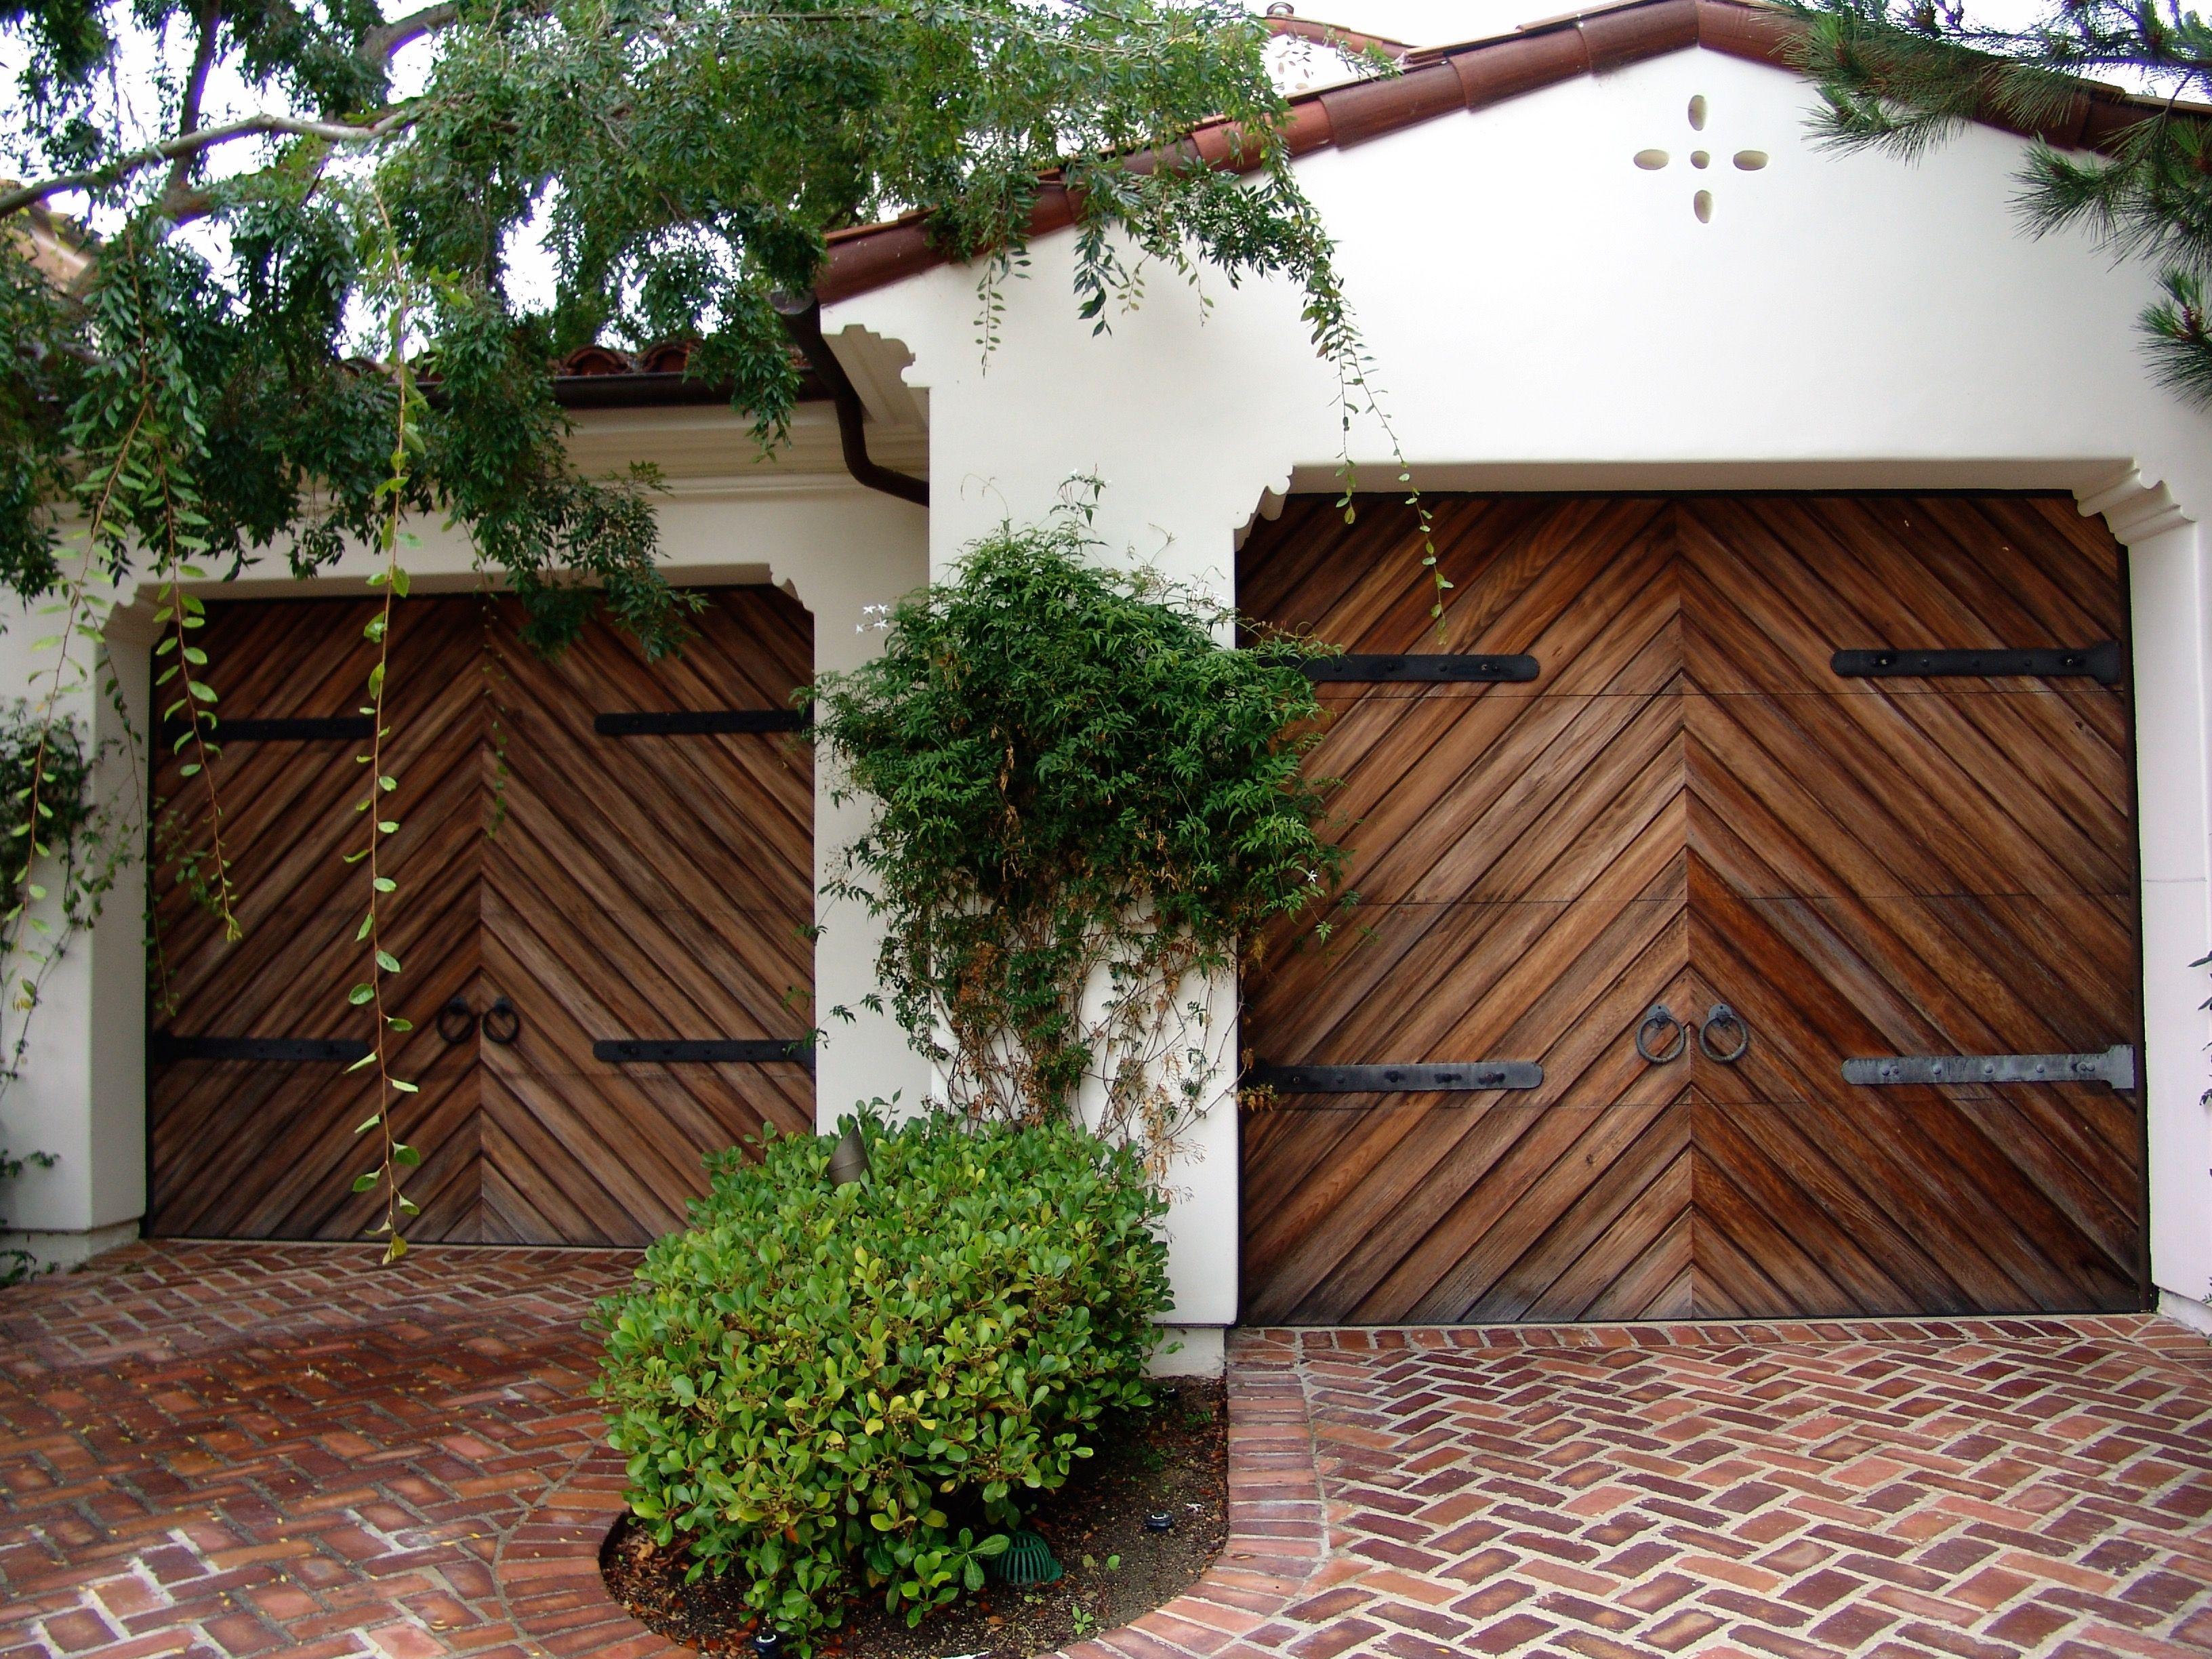 These Custom Made Spanish Style Garage Doors Feature A Beautiful Herringbone Pattern And Feature Long Hinge Spanish Style Homes Garage Door Design Garage Doors